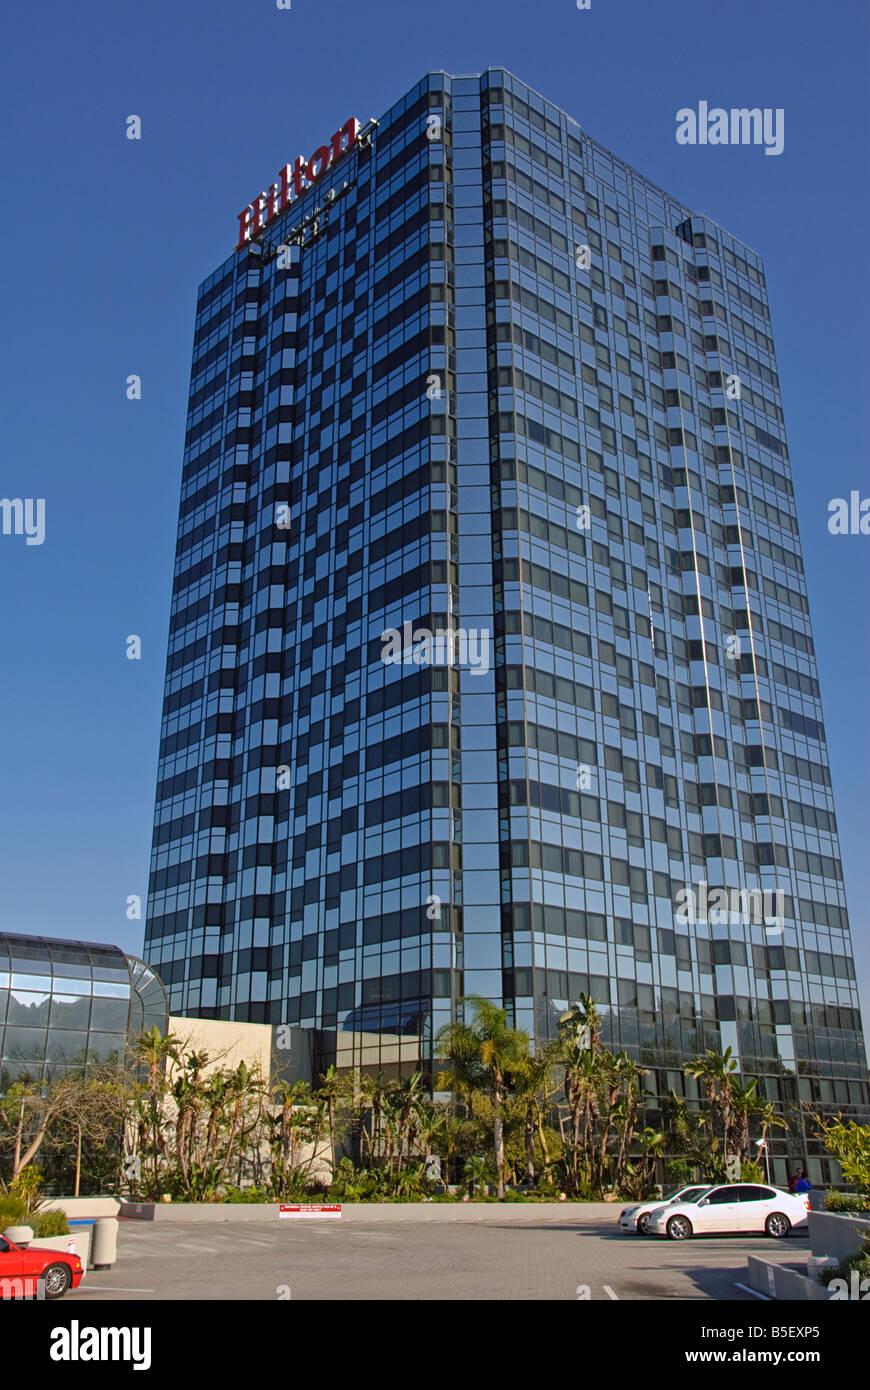 Hilton Hotel Universal City CA . Universal Studios Hollywood, Citywalk - Stock Image